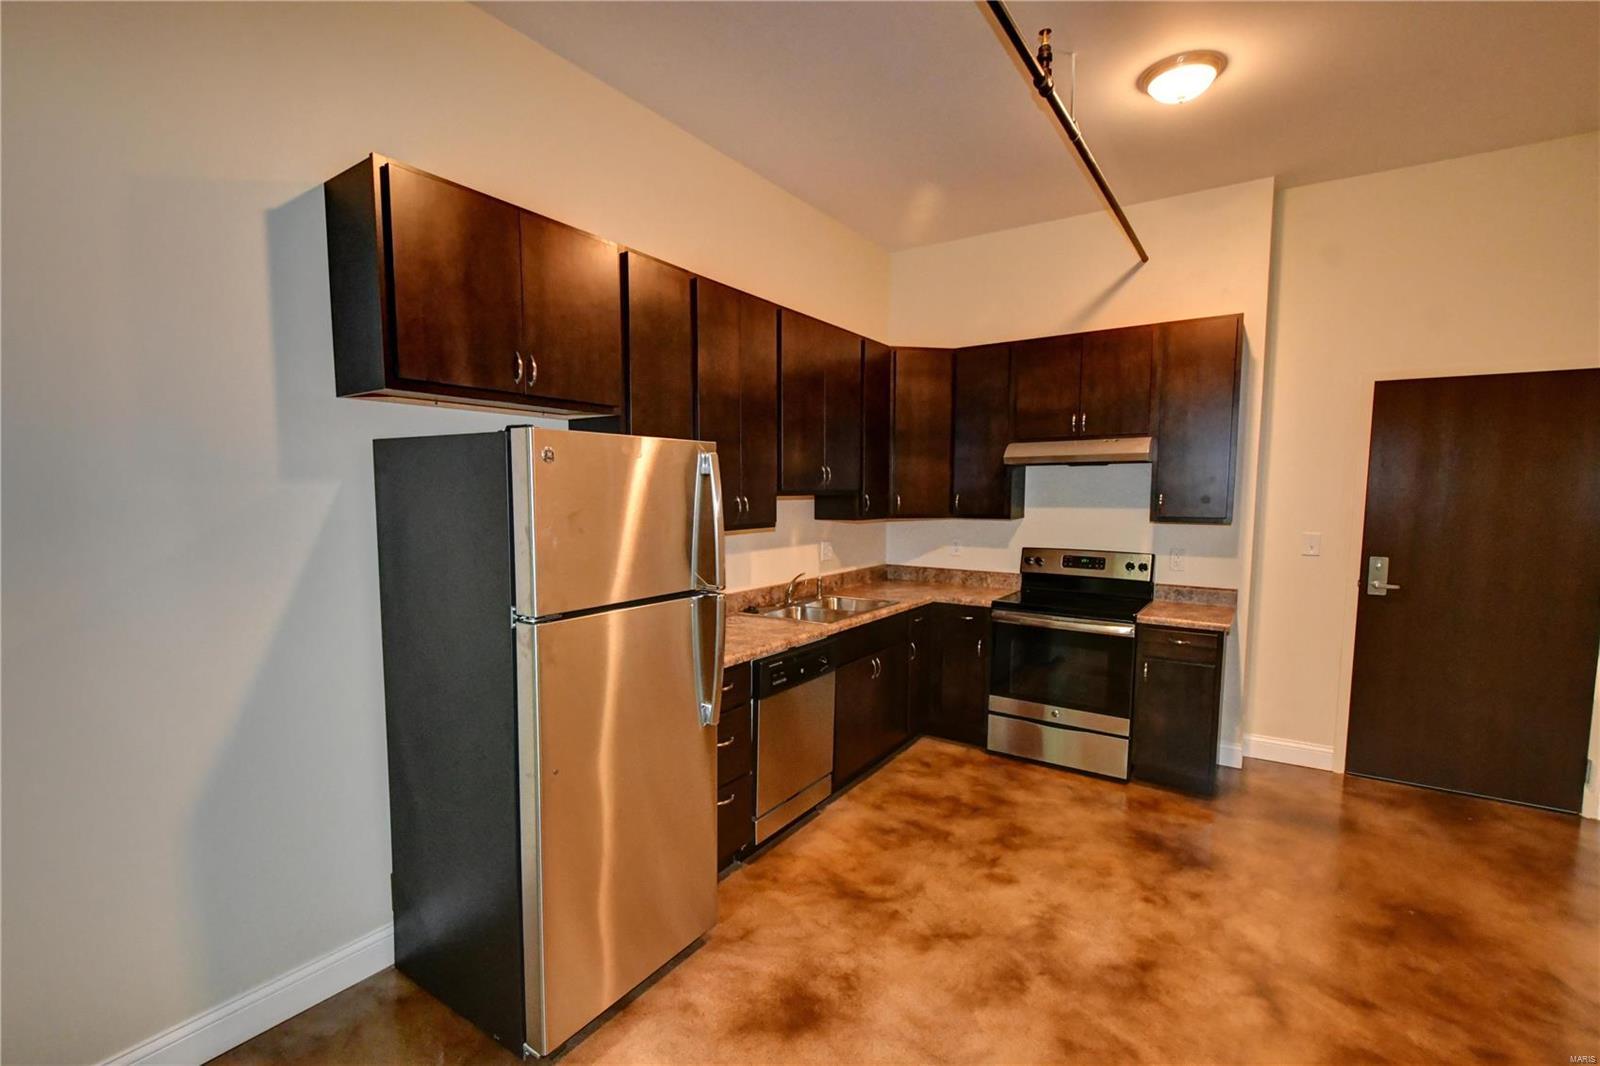 257 S FLORISSANT Road #316 Property Photo - Ferguson, MO real estate listing